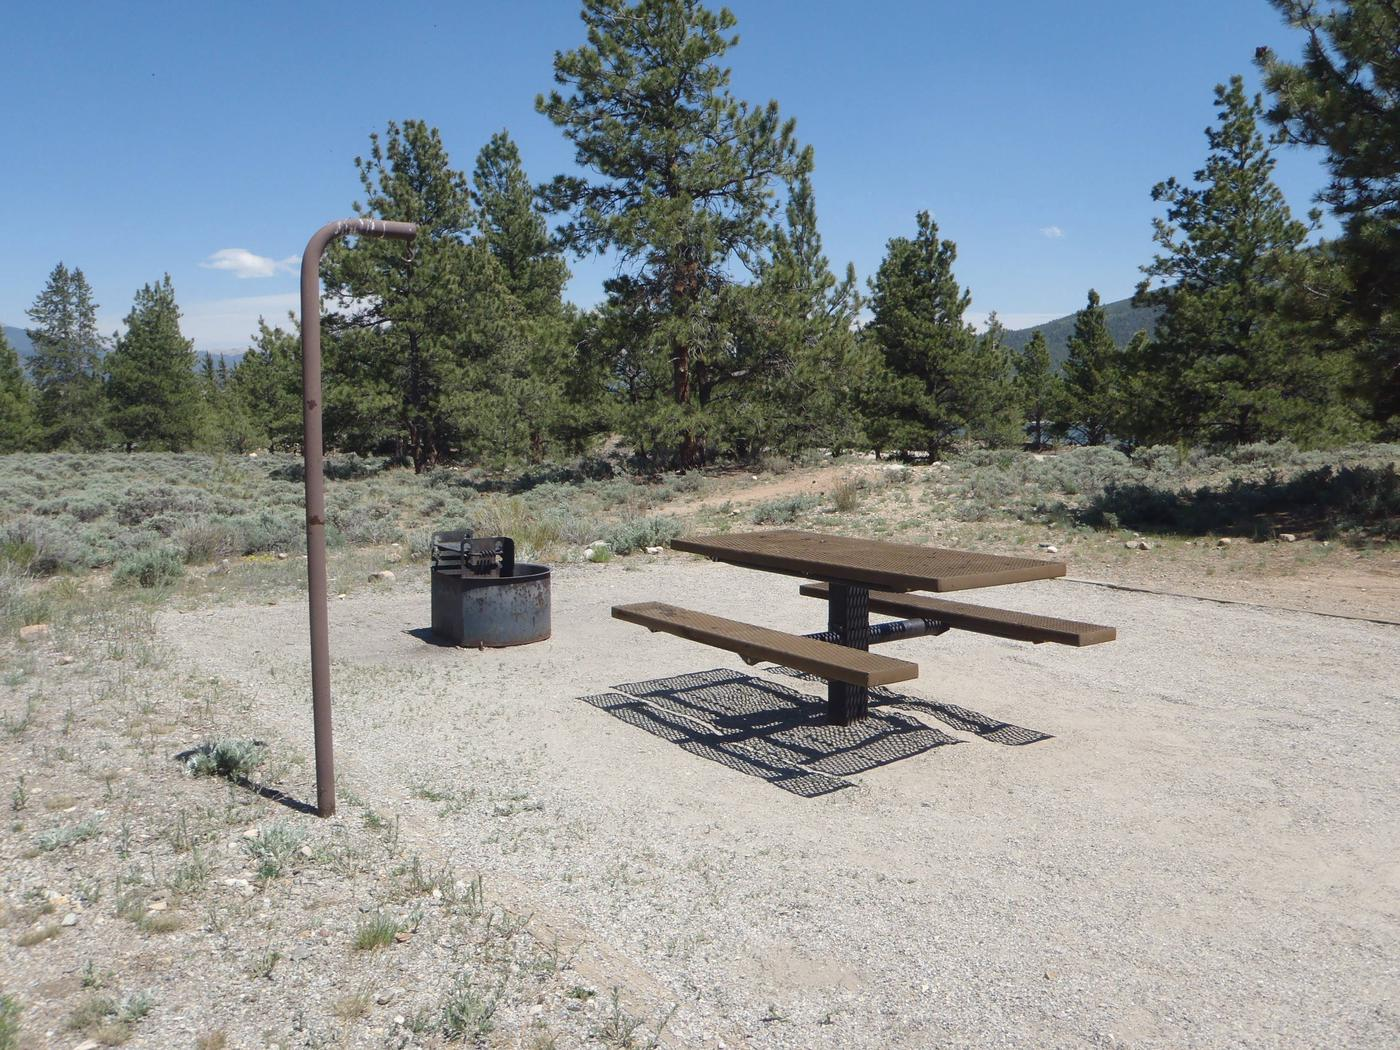 White Star Campground, site 18